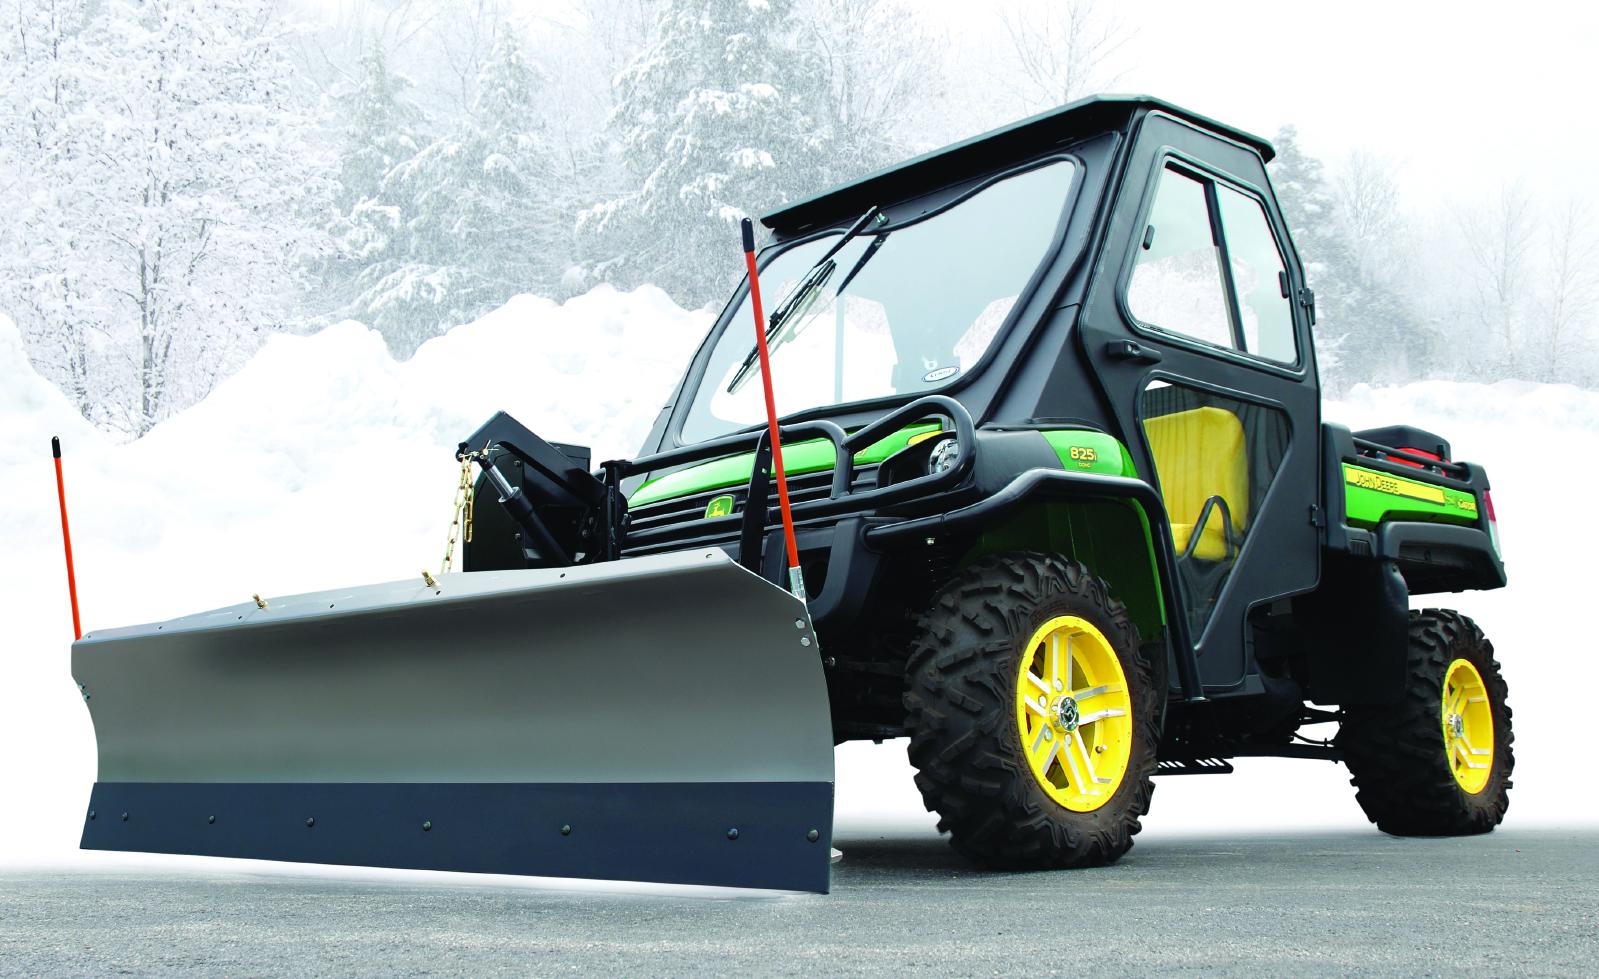 John Deere Gator Plow >> Curtis 72 inch Snow Plow Blade for John Deere XUV Gators | eBay